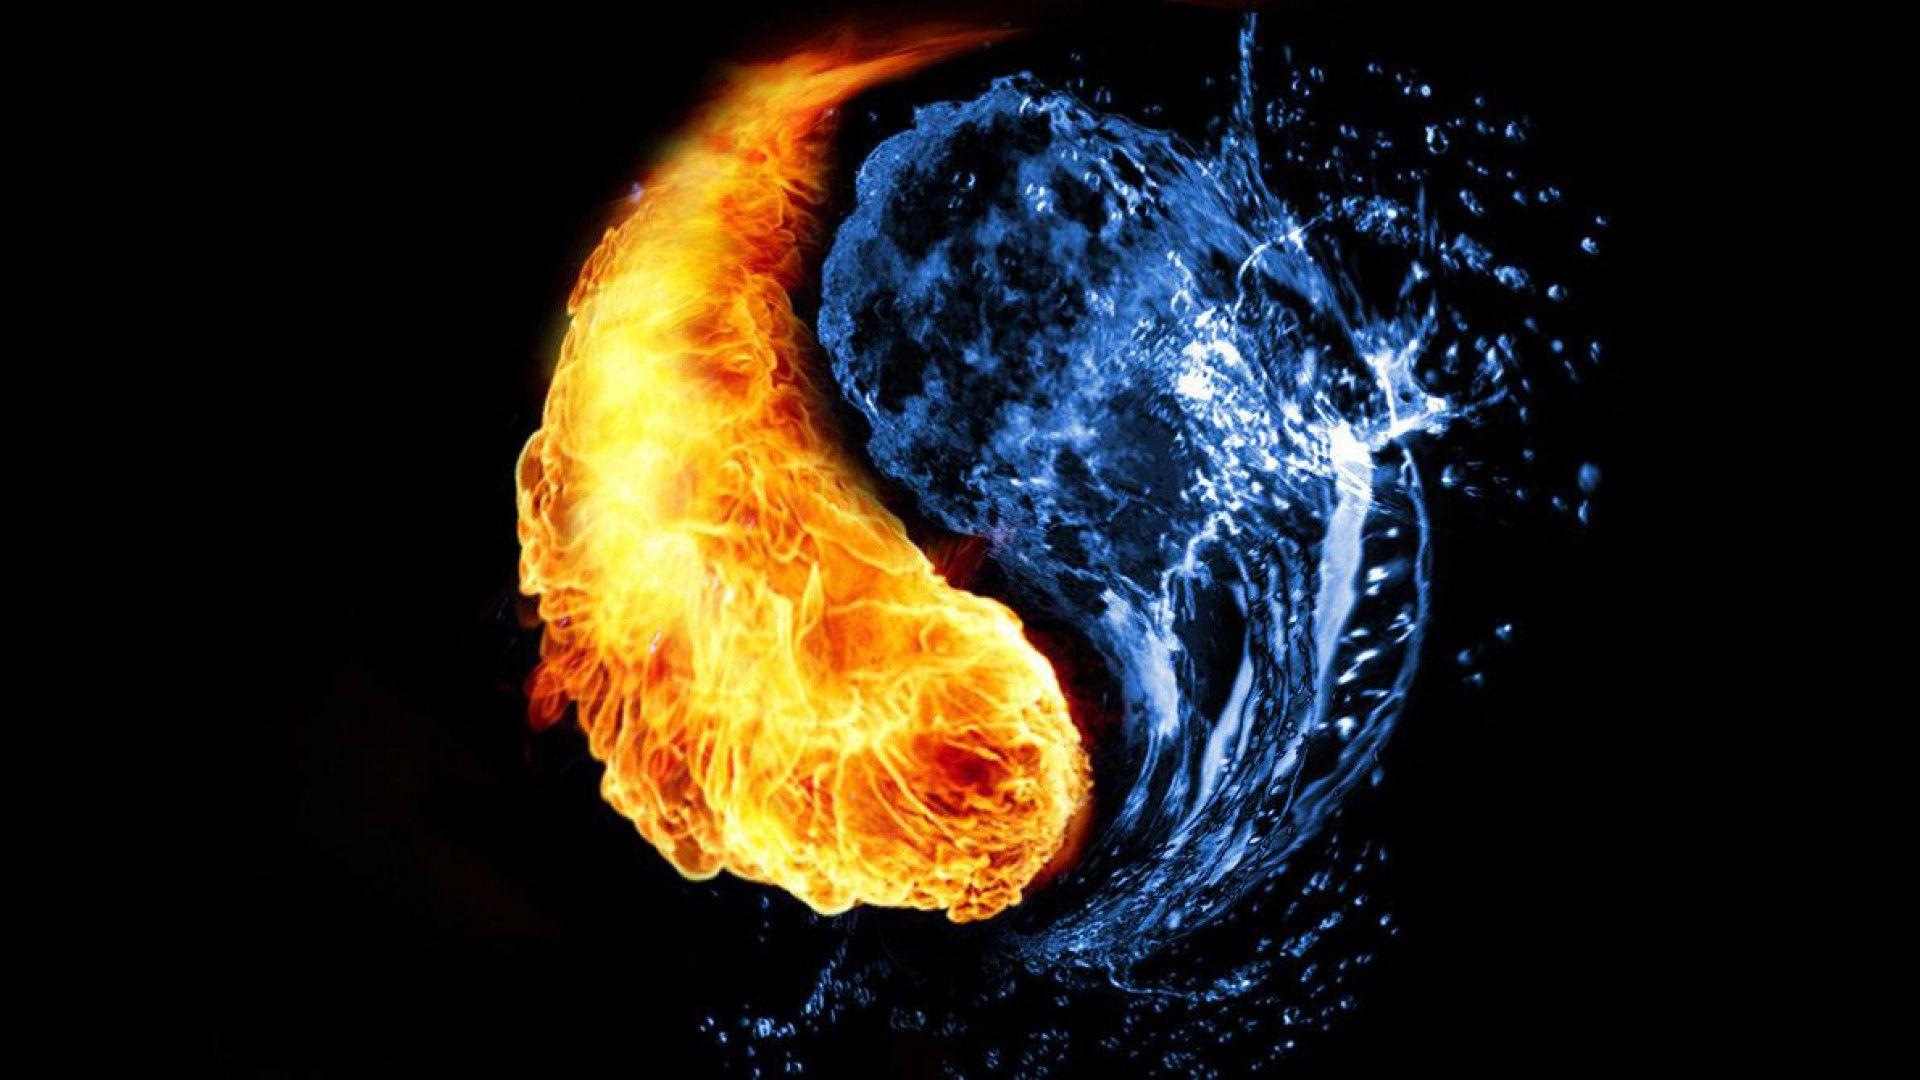 HD Quality Fire and Water Yin Yang Wallpaper SiWallpaper